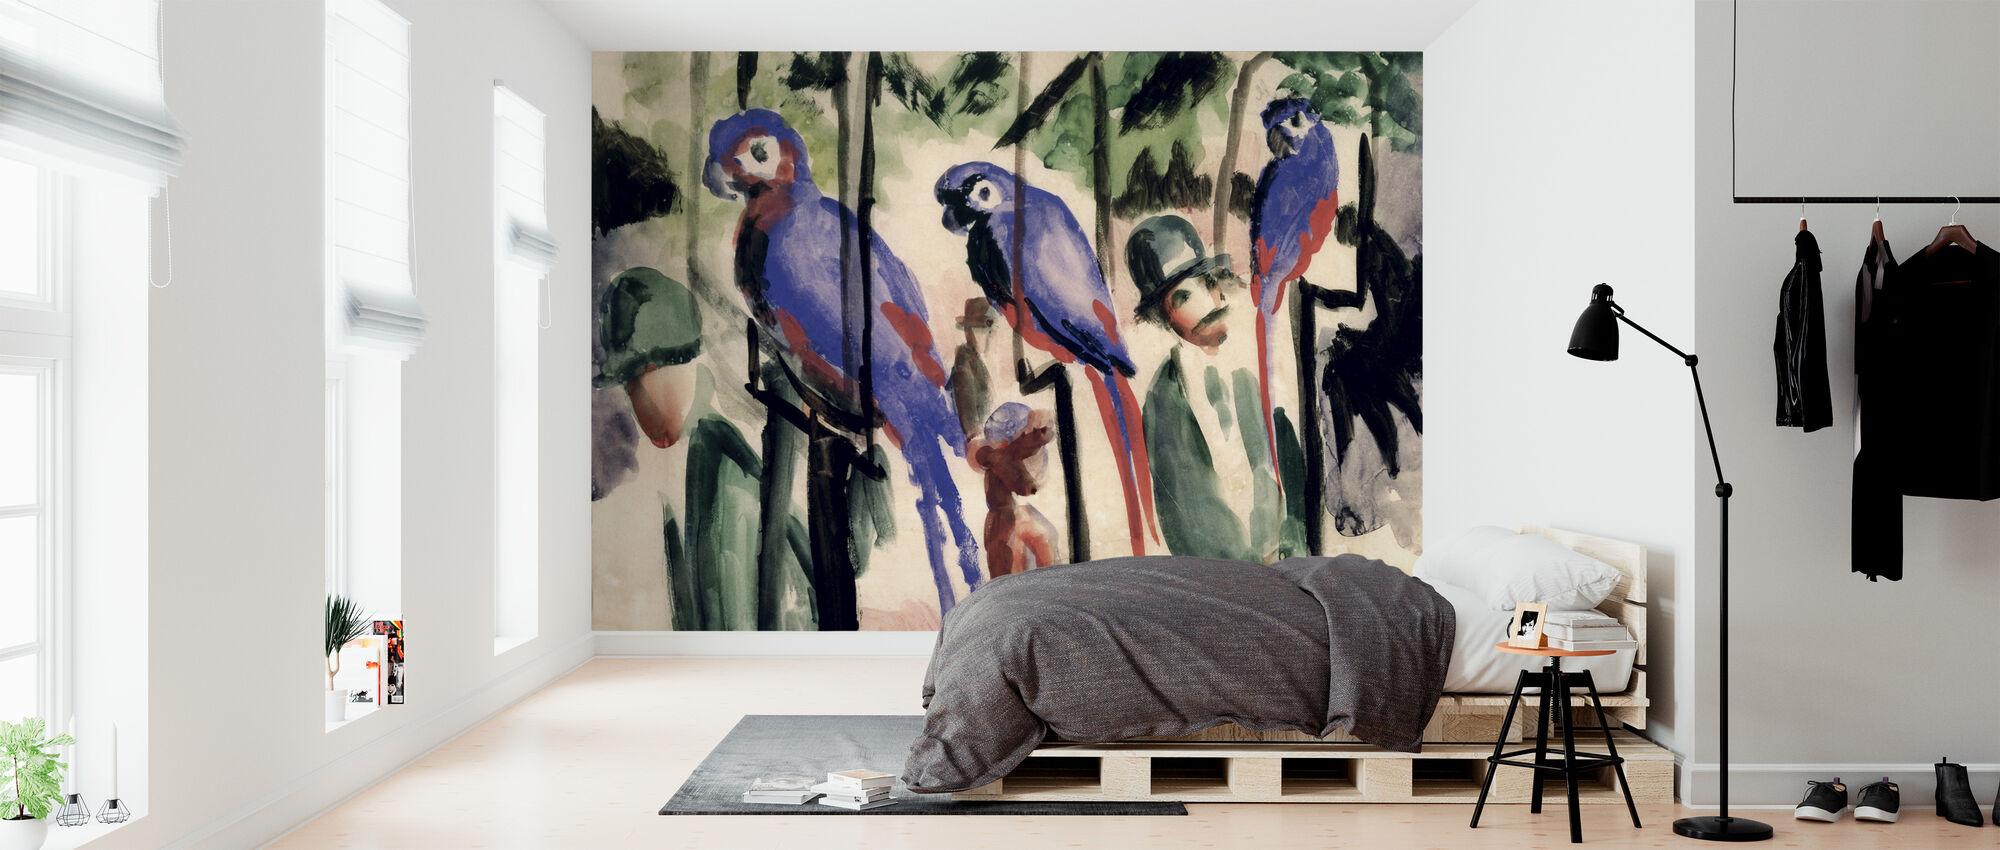 Blue Parrots - August Macke – Fototapete nach Maß – Photowall